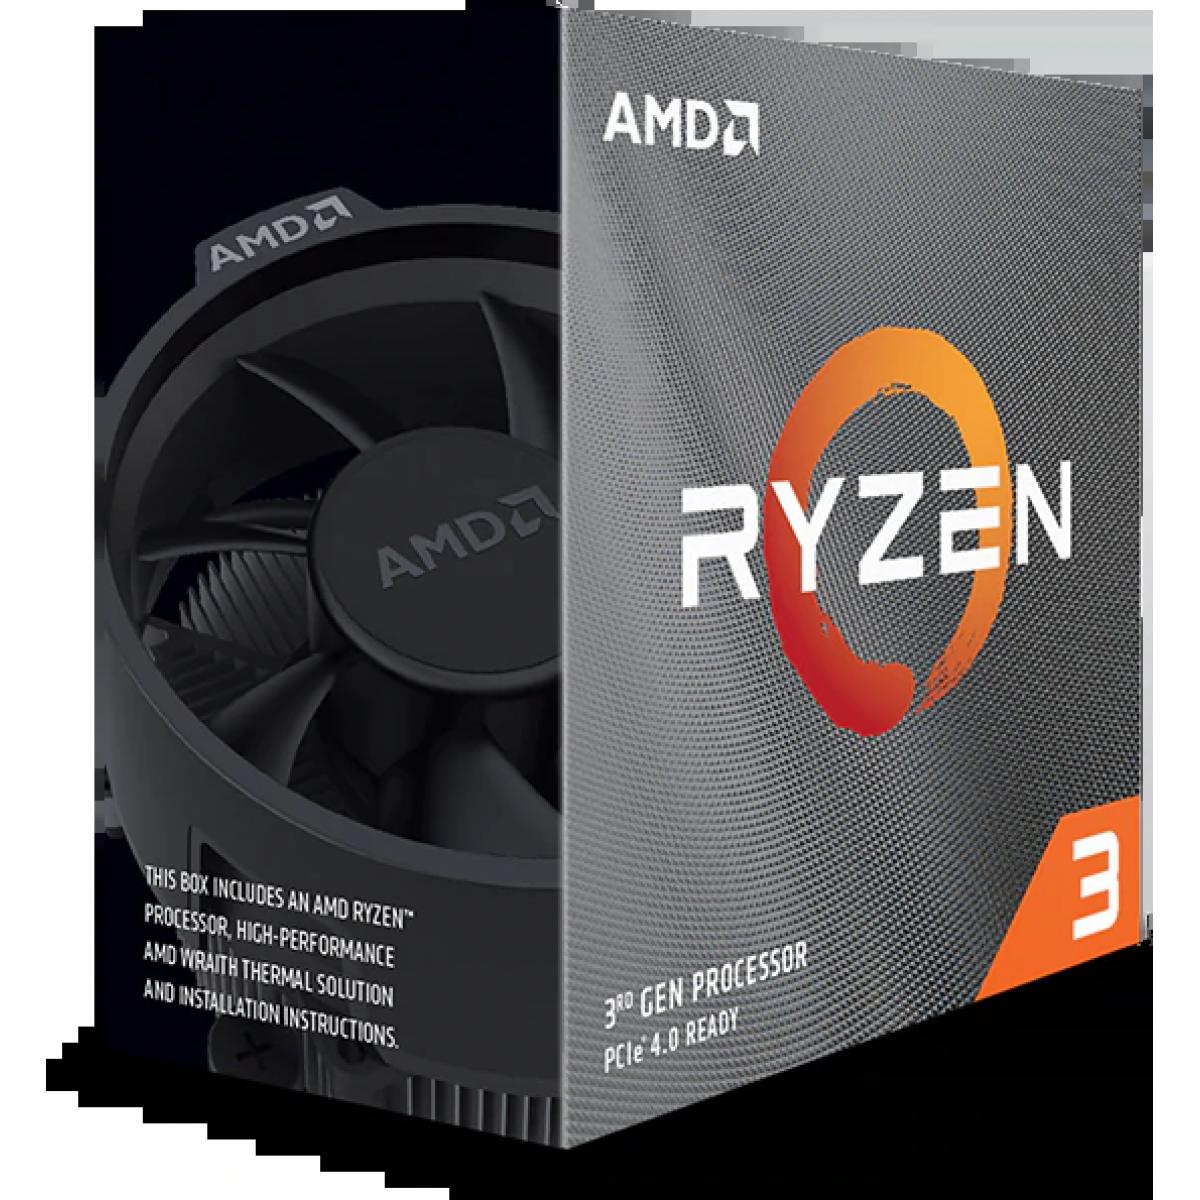 Processador AMD Ryzen 3 3100 3.6GHz (3.9GHz Turbo), 4-Cores 8-Threads, Cooler Wraith Stealth, AM4, 100- 100000284BOX